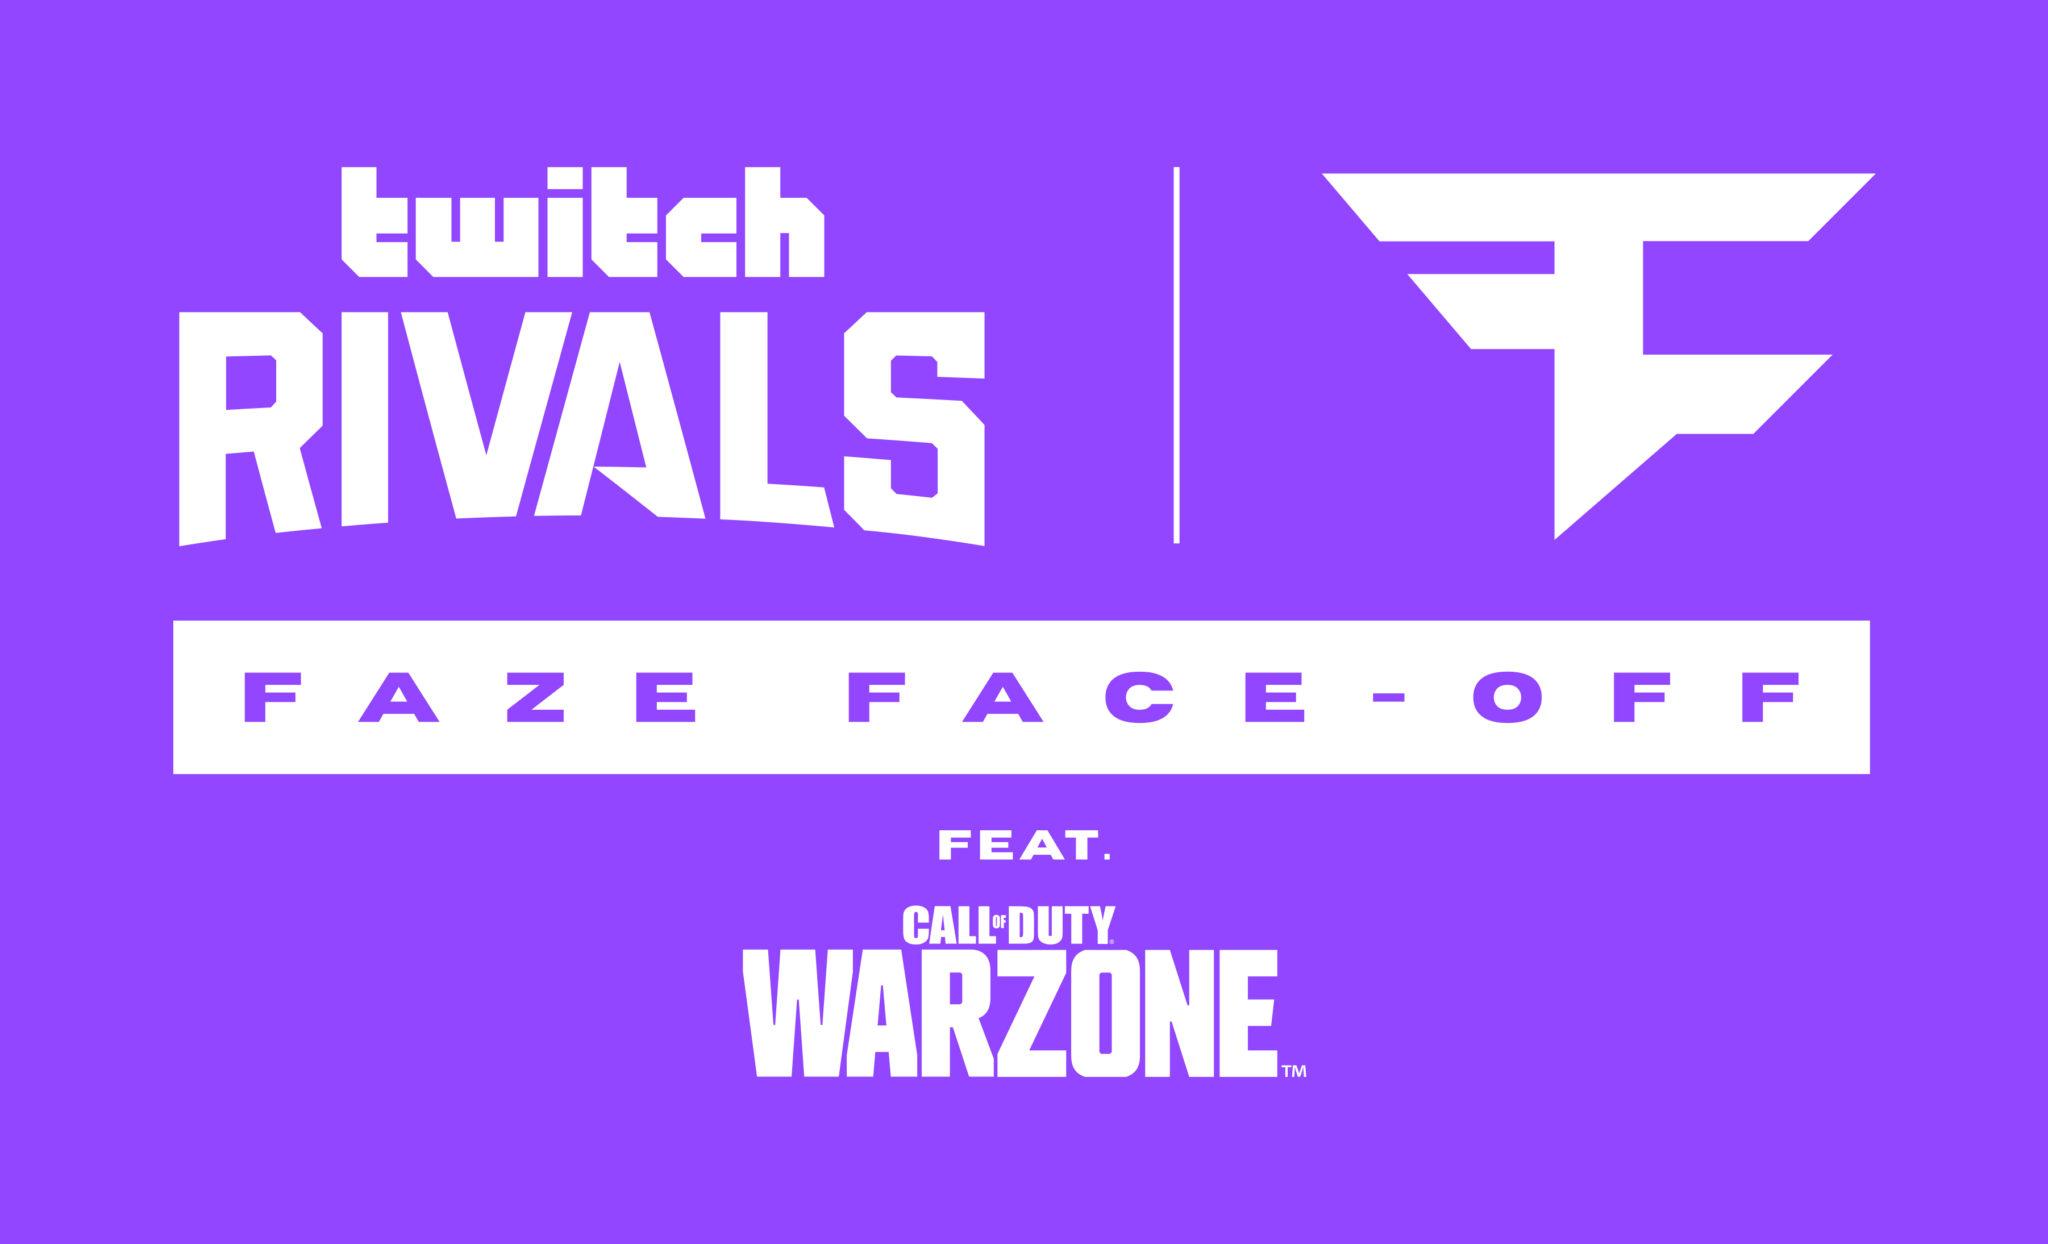 Warzone Twitch Rivals FaZe event.